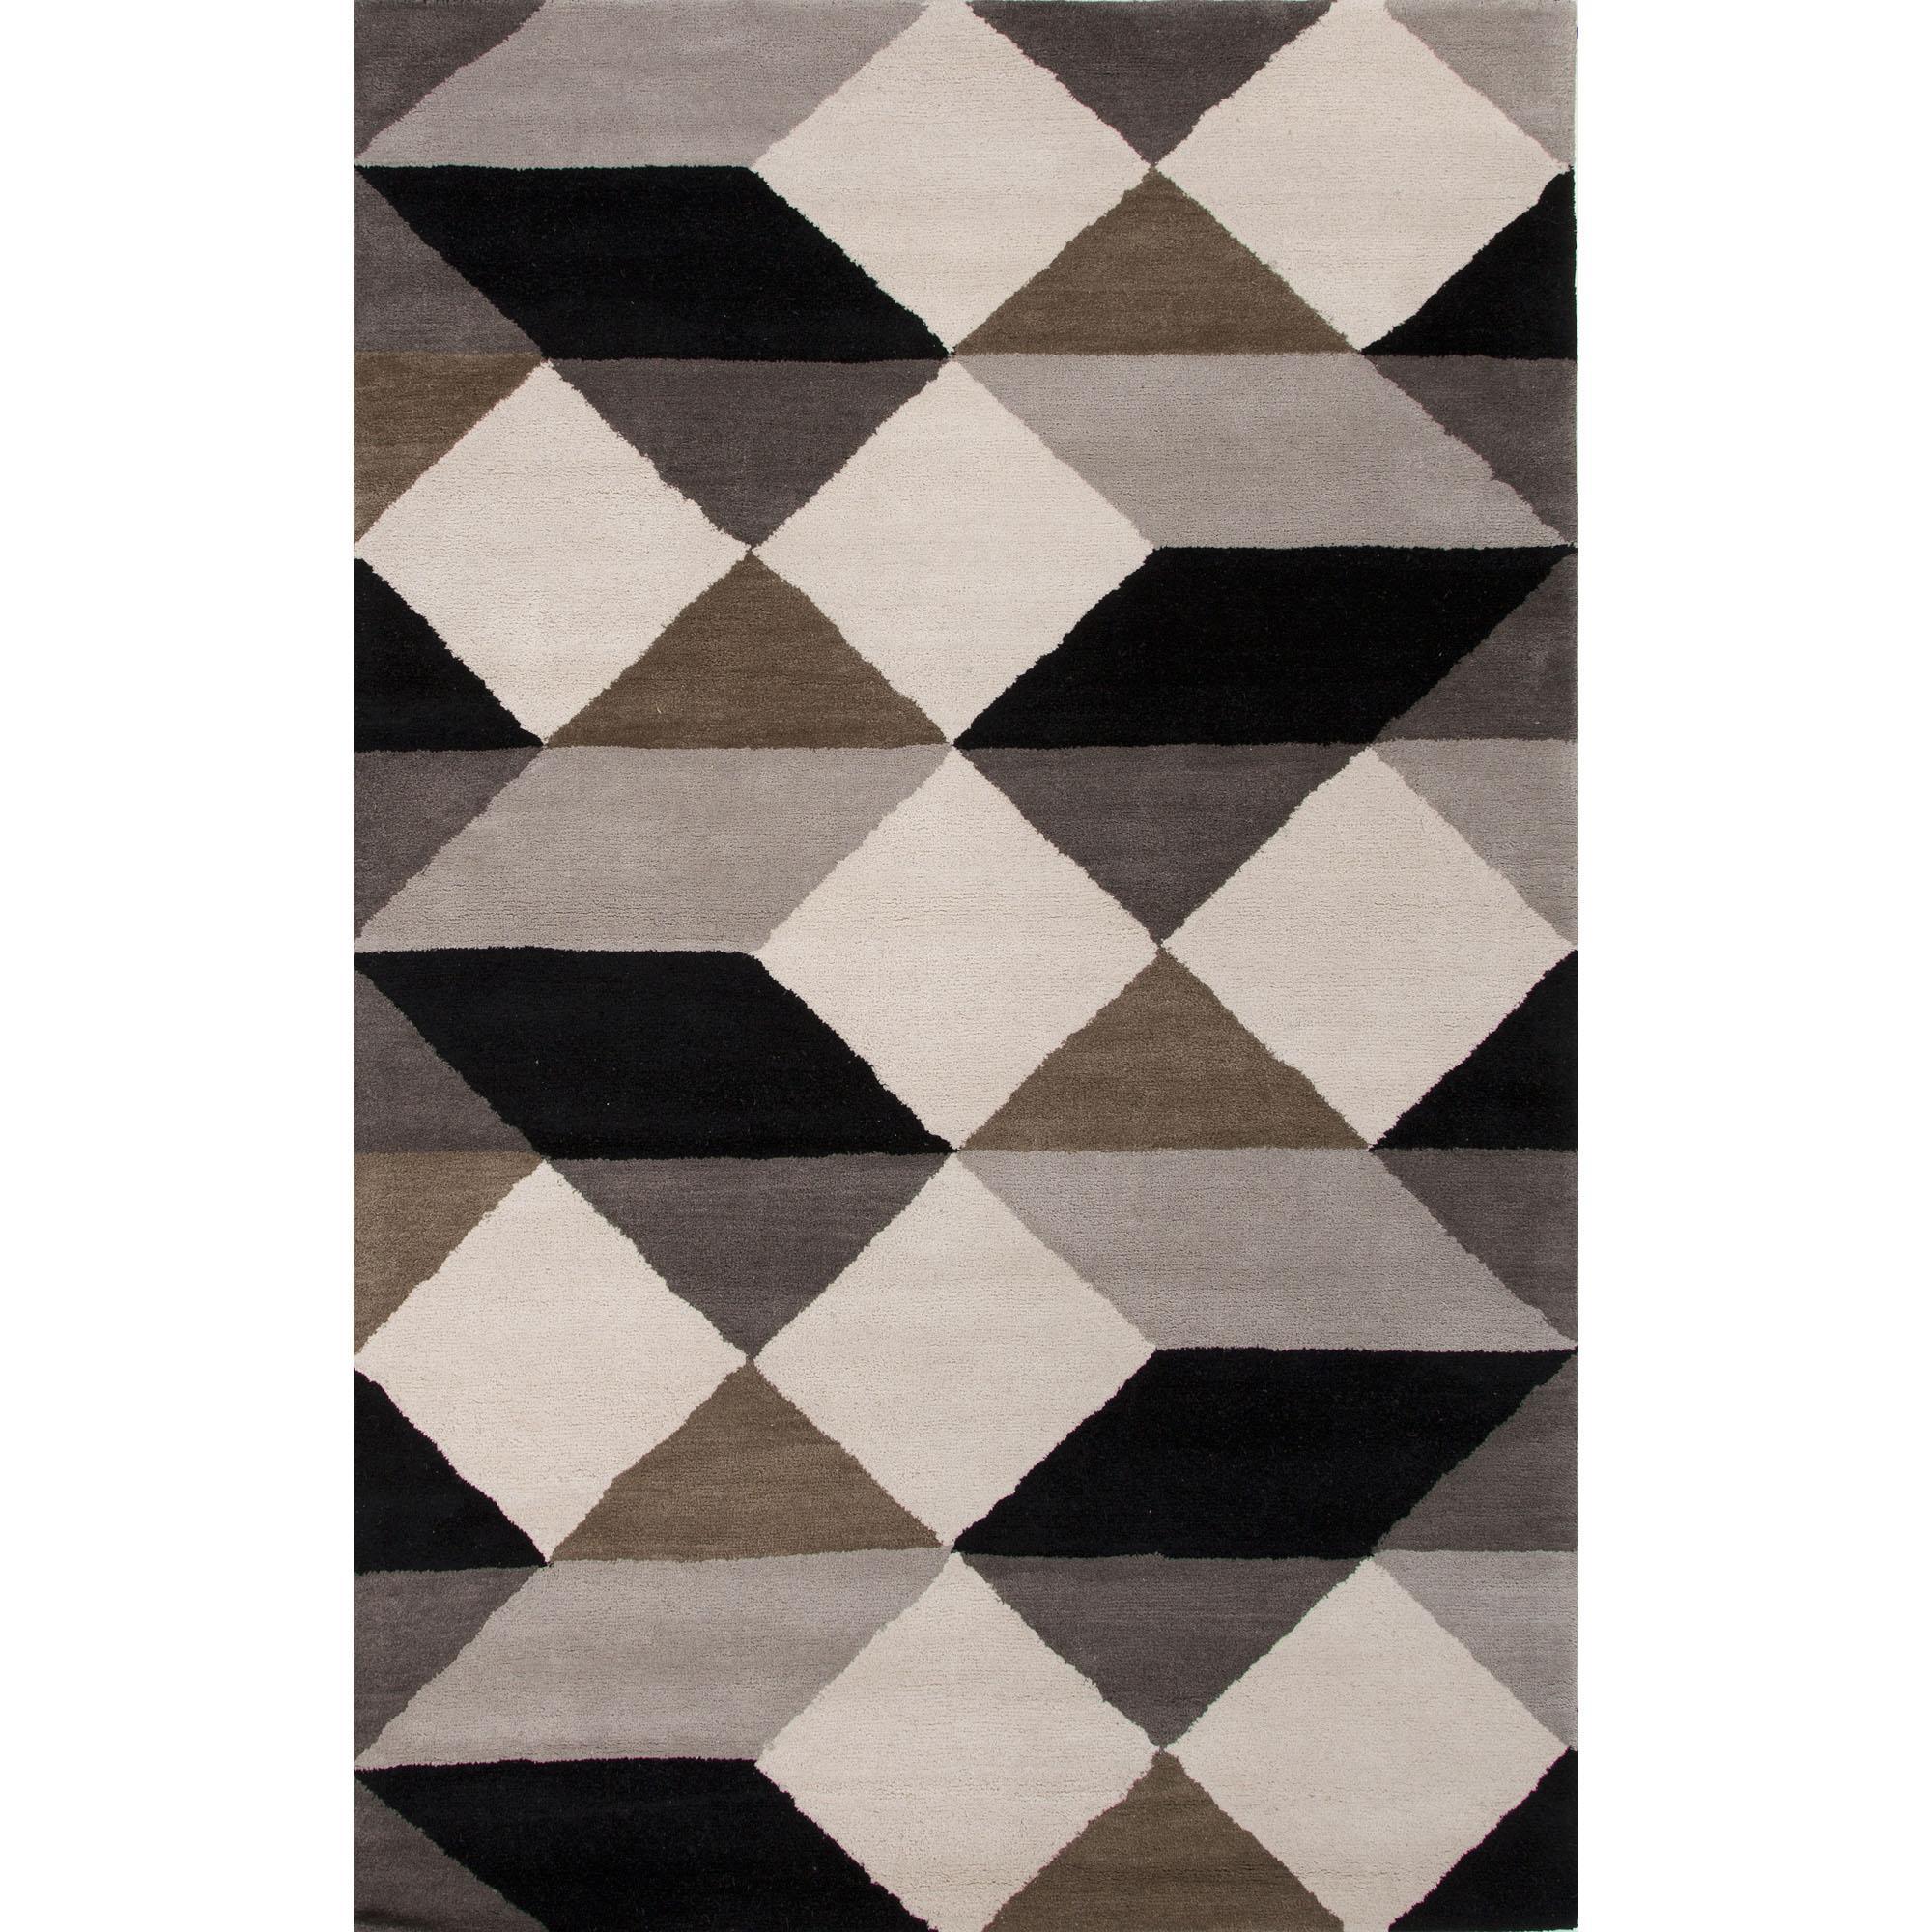 JAIPUR Rugs En Casa By Luli Sanchez Tufted 2 x 3 Rug - Item Number: RUG116802